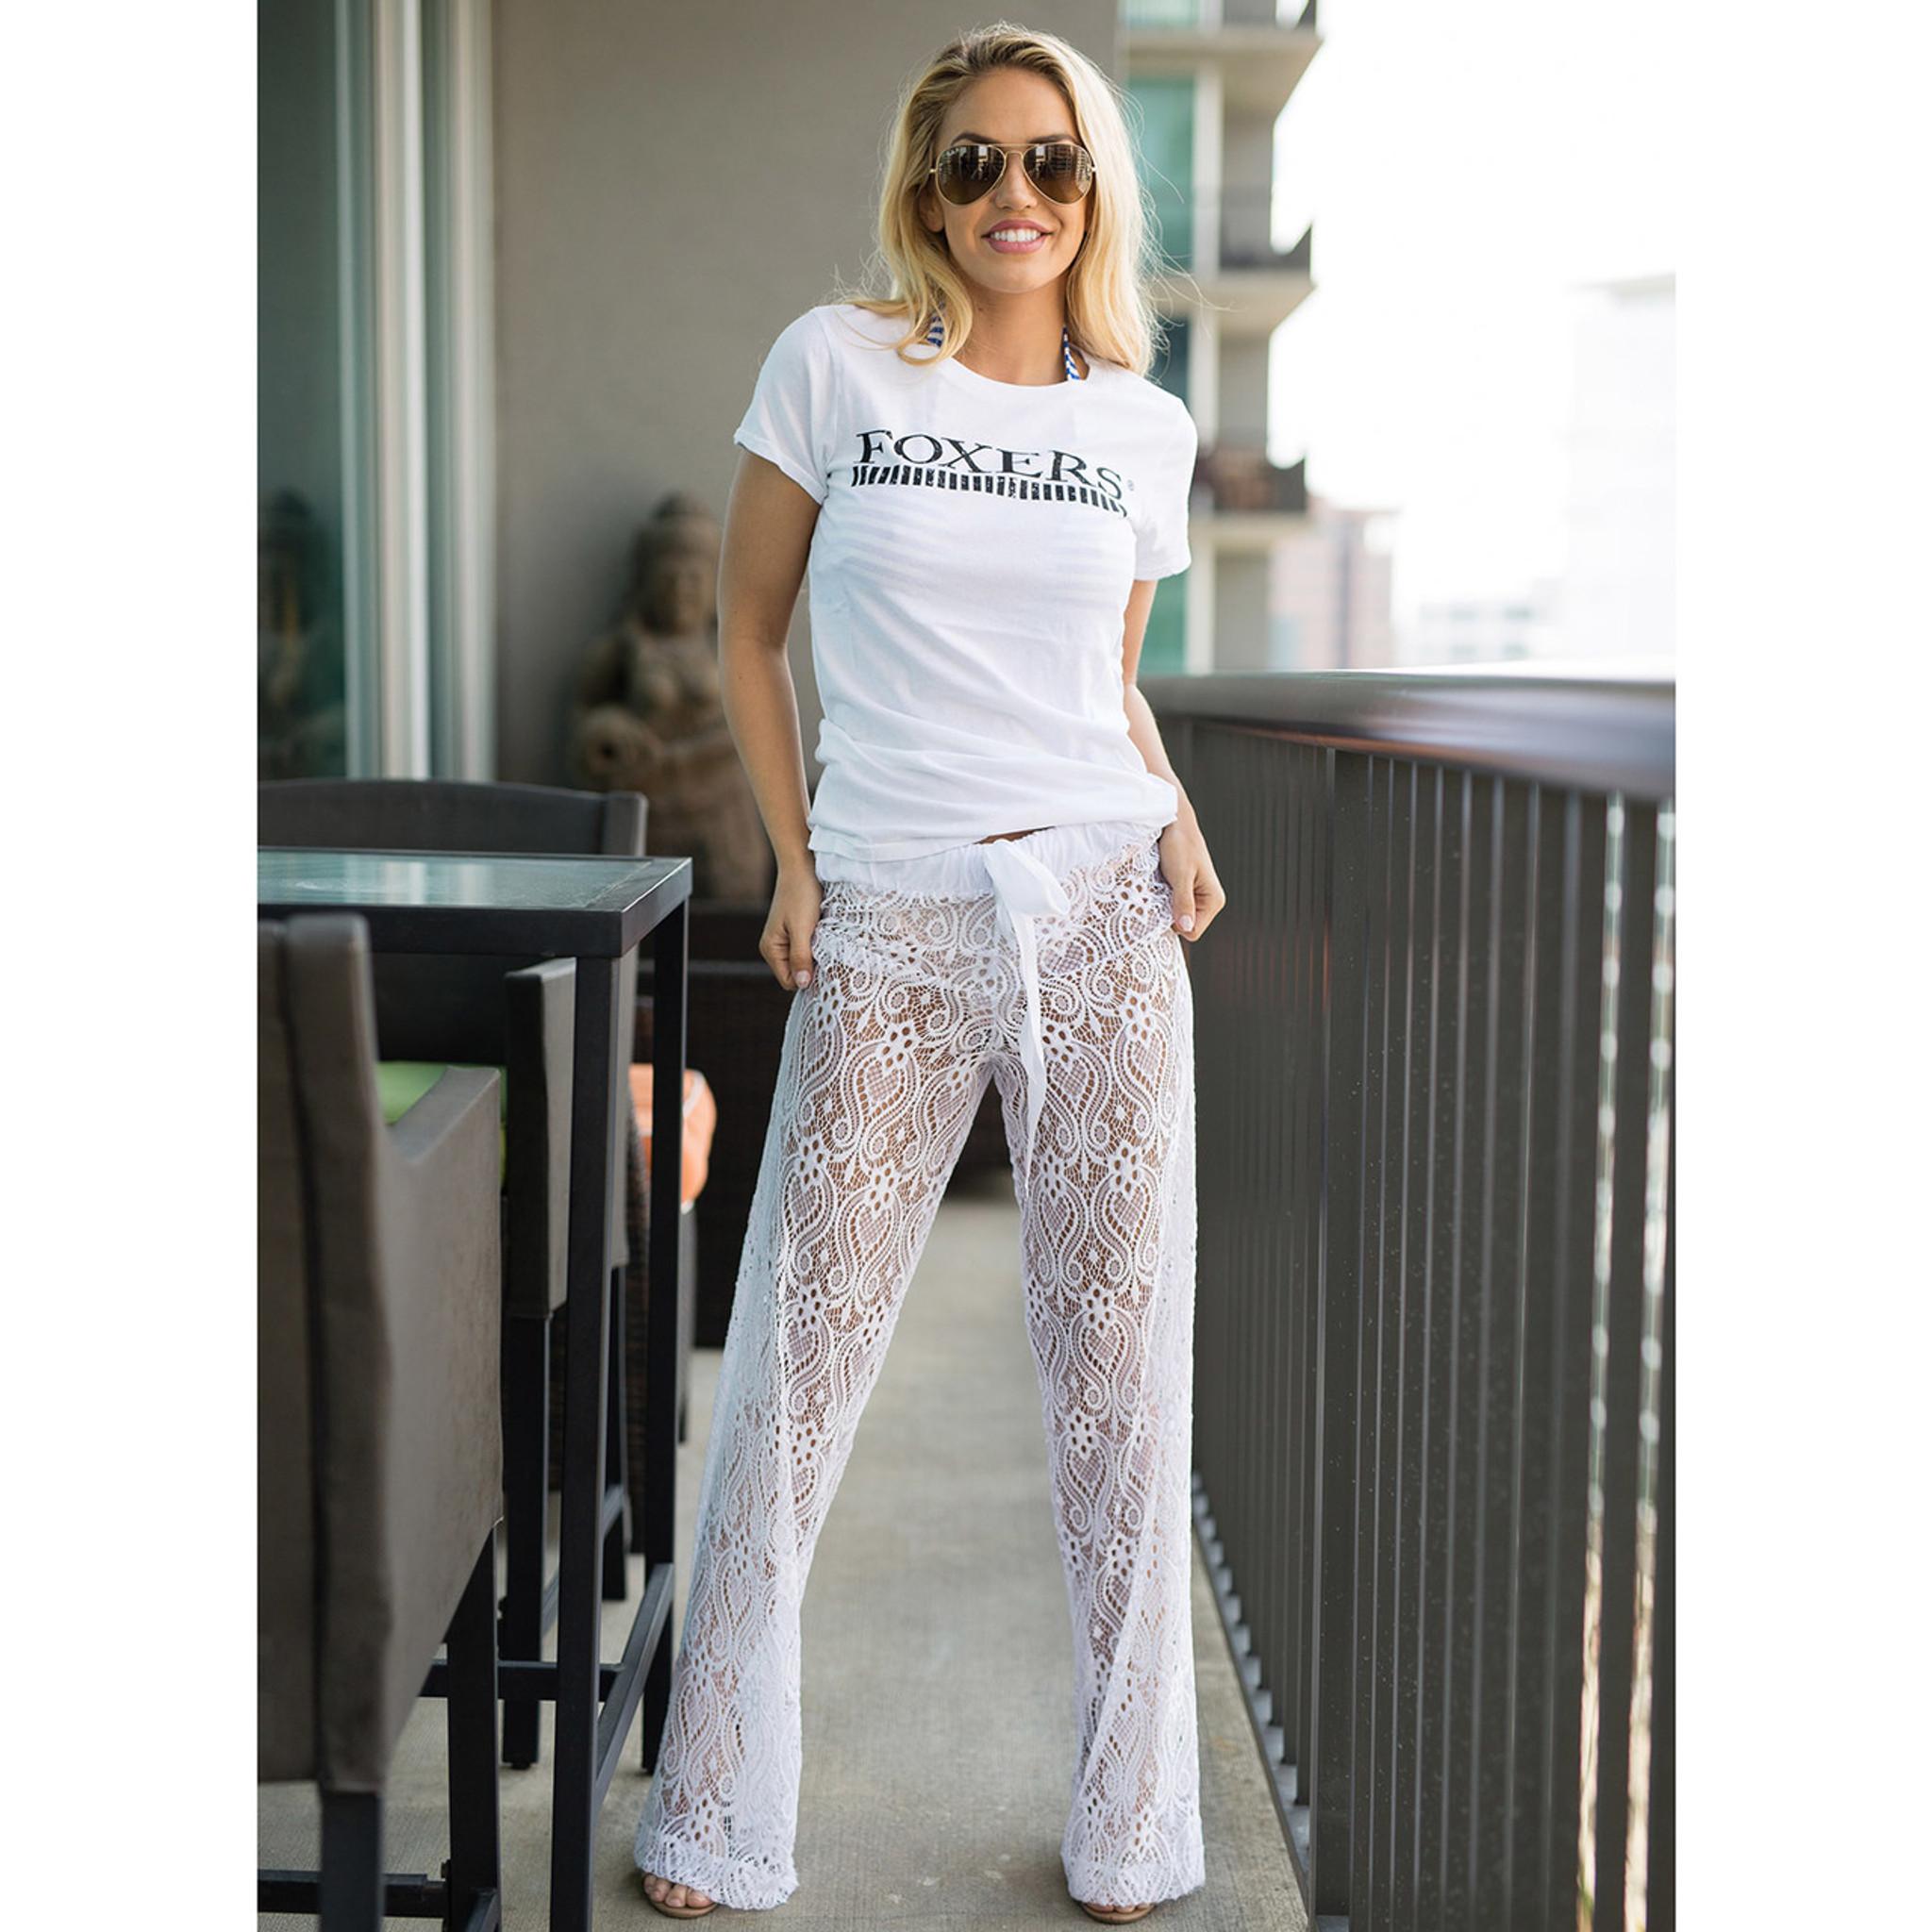 1e3c93fbc1 White Lace Palazzo Pants Swim Cover Up | FOXERS Loungewear for Women